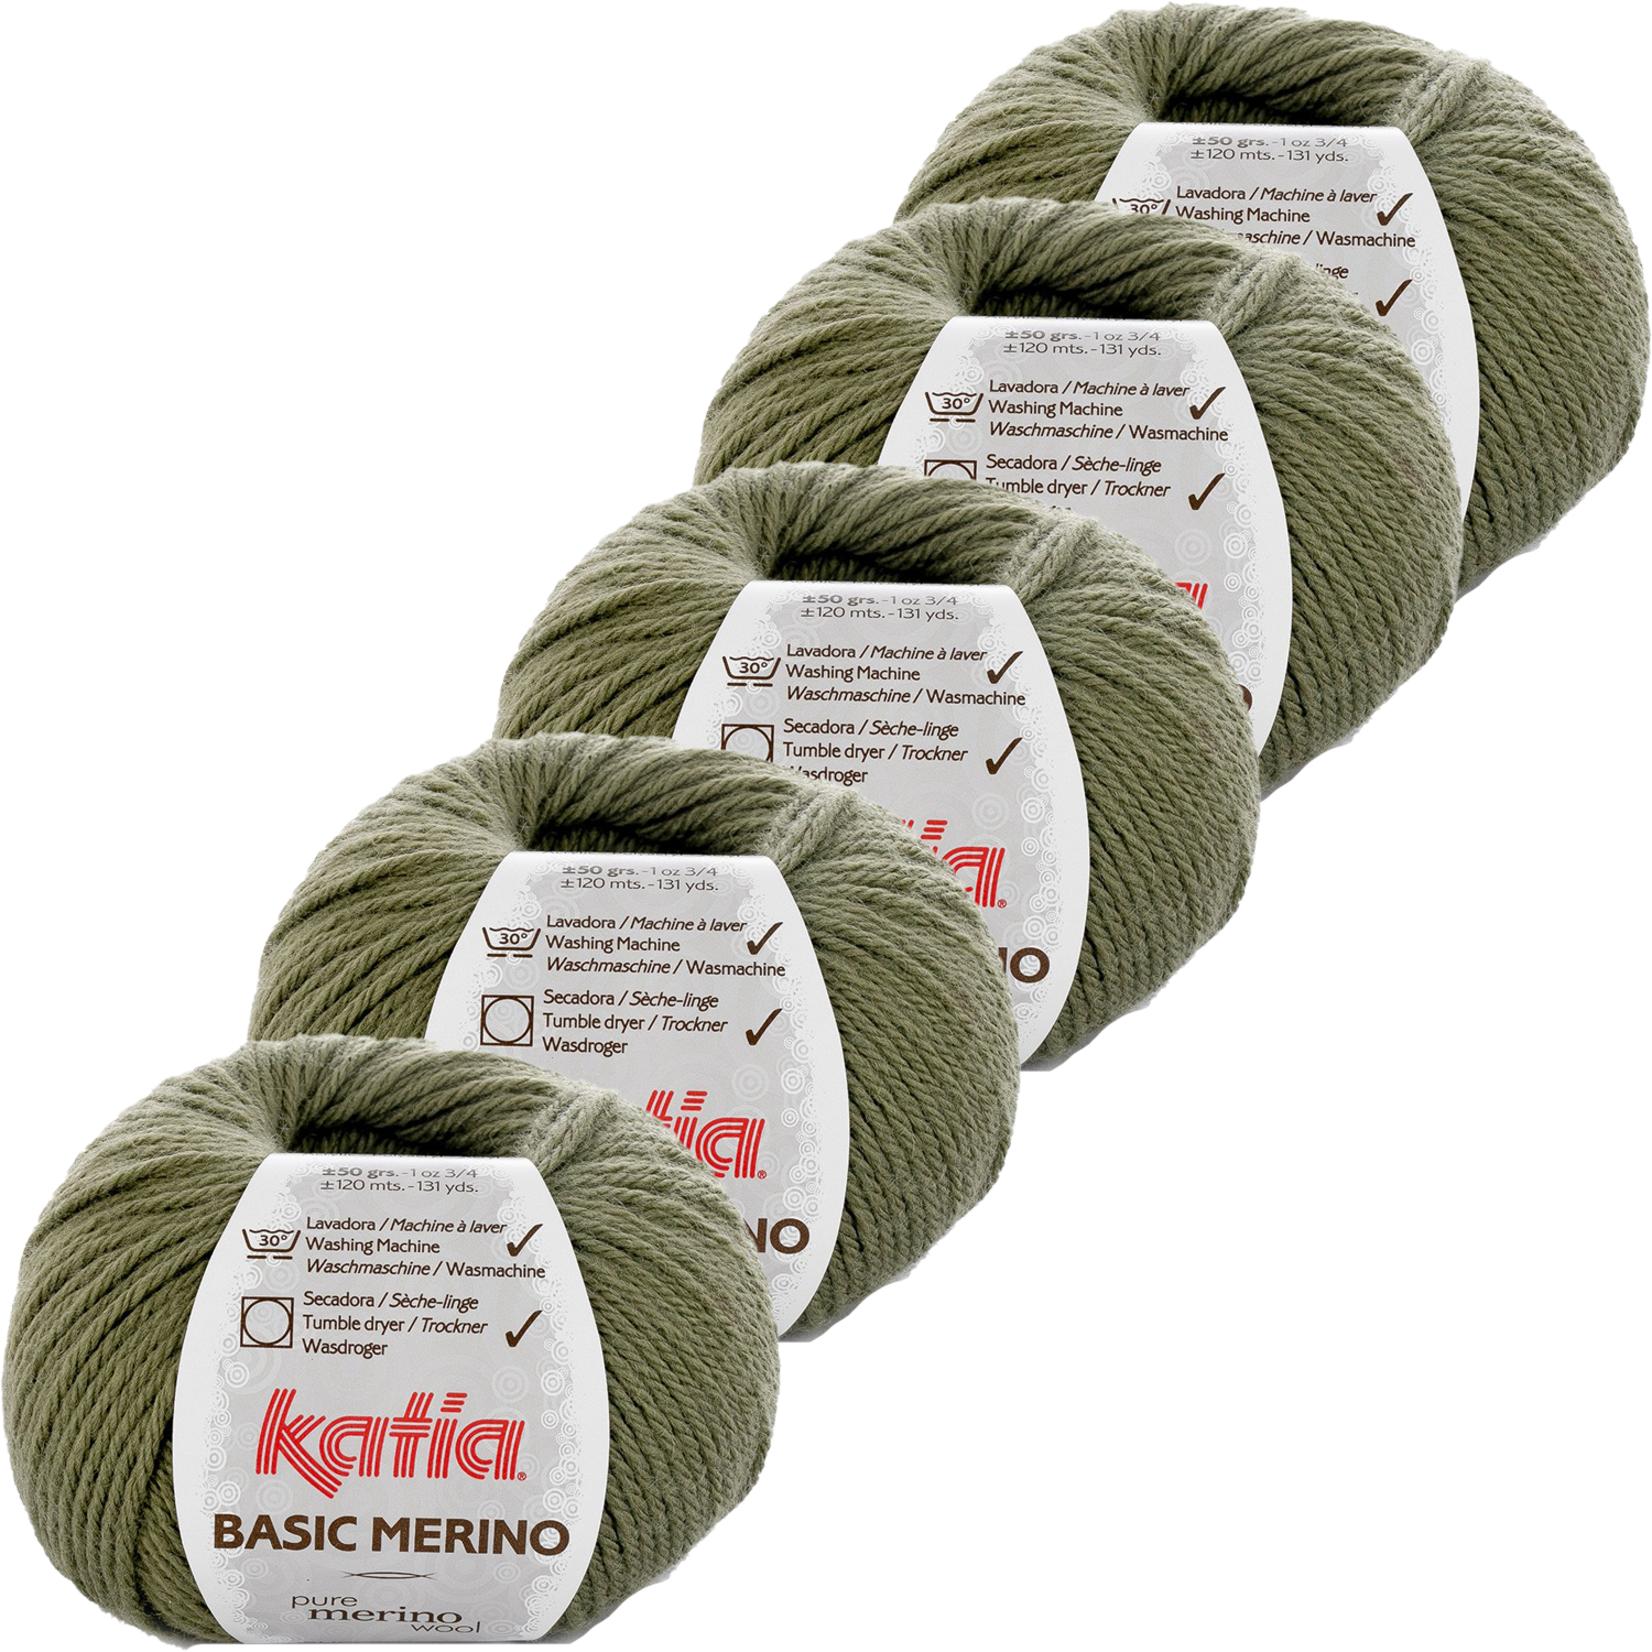 Katia Basic Merino - kleur 70_Kaki - bundel 5 bollen 50 gr.  van 120 m.